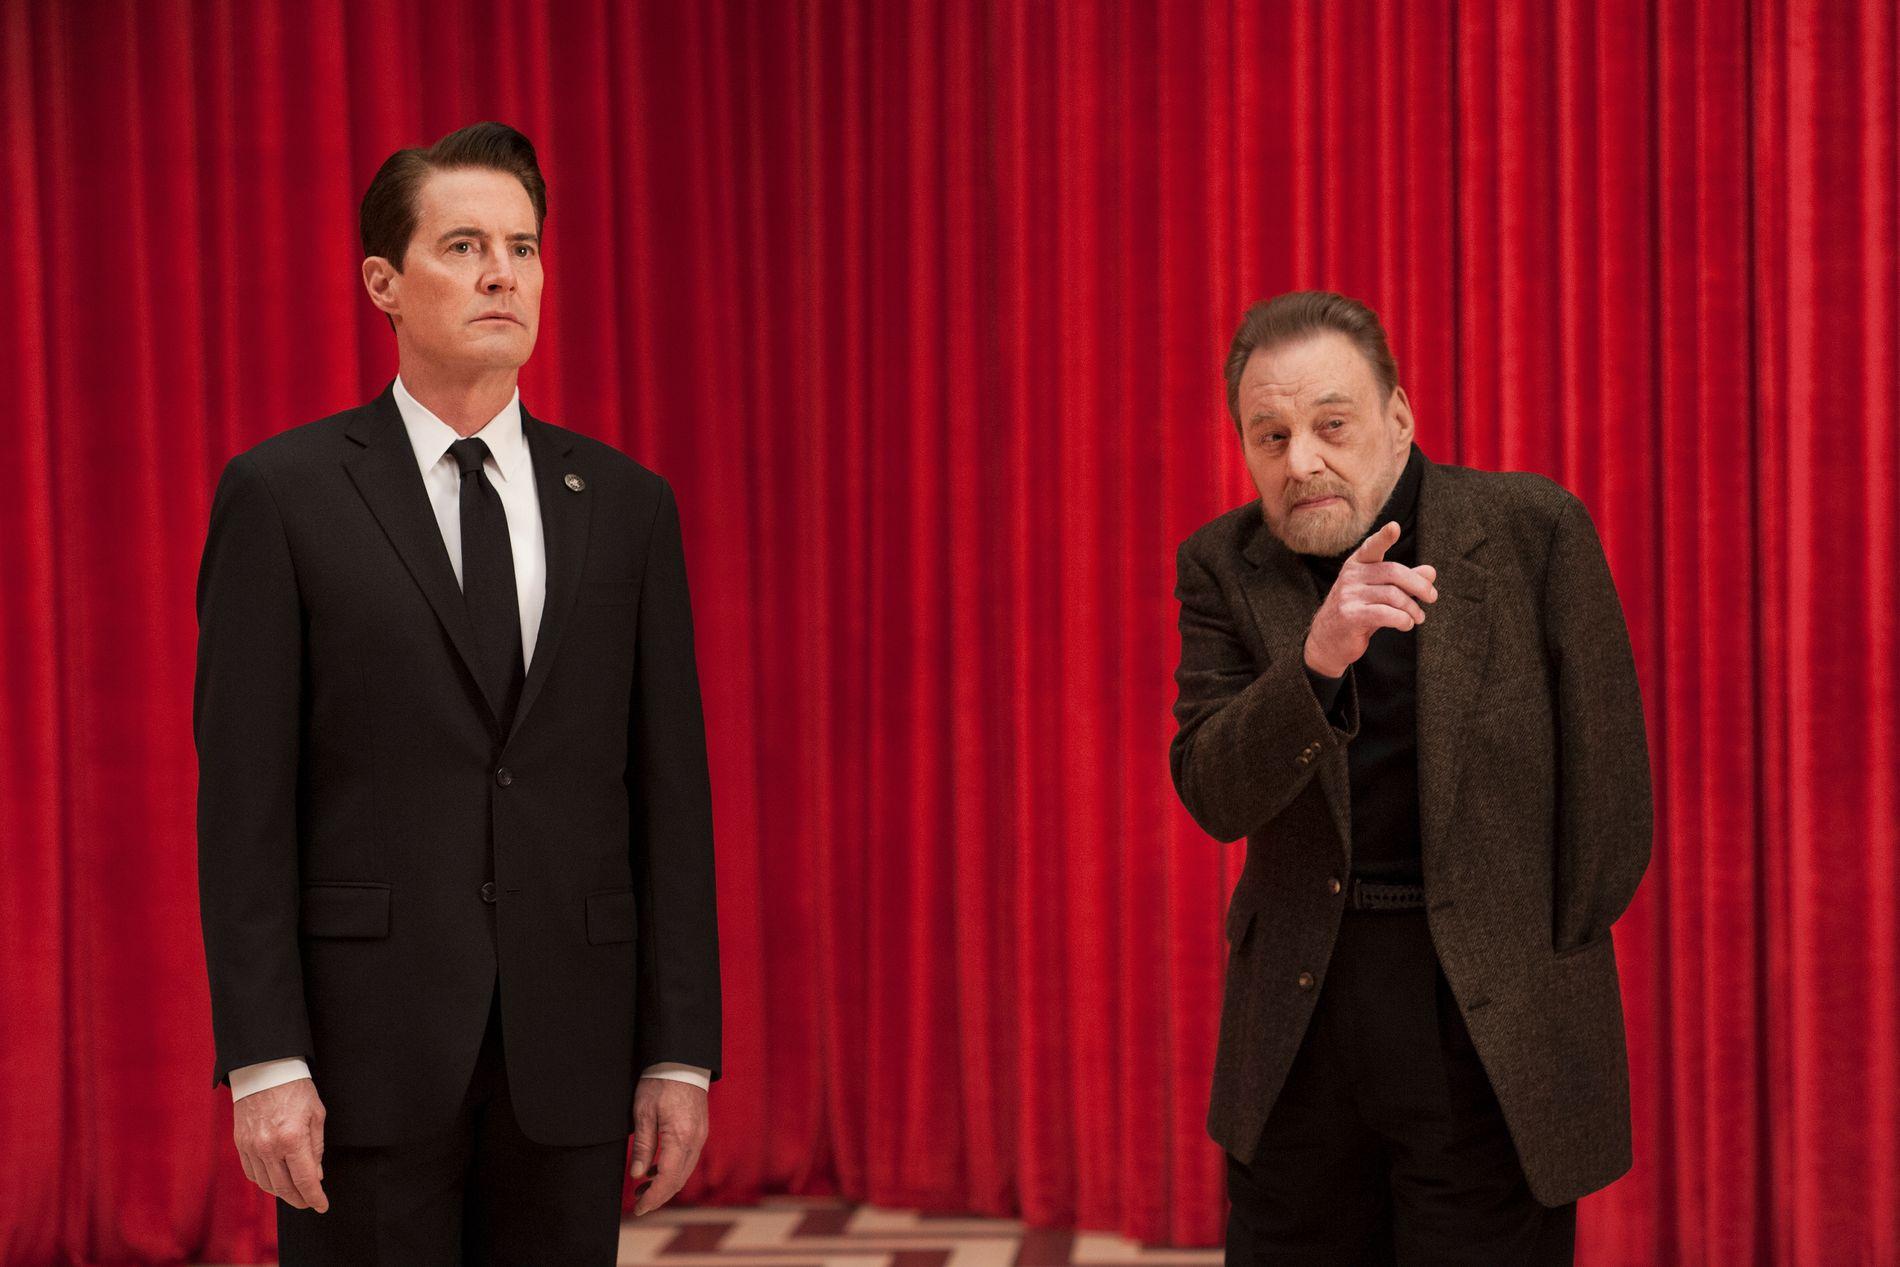 VENDTE TILBAKE: Kyle MacLachlan og Al Strobel i «Twin Peaks». Foto: Suzanne Tenner/Showtime